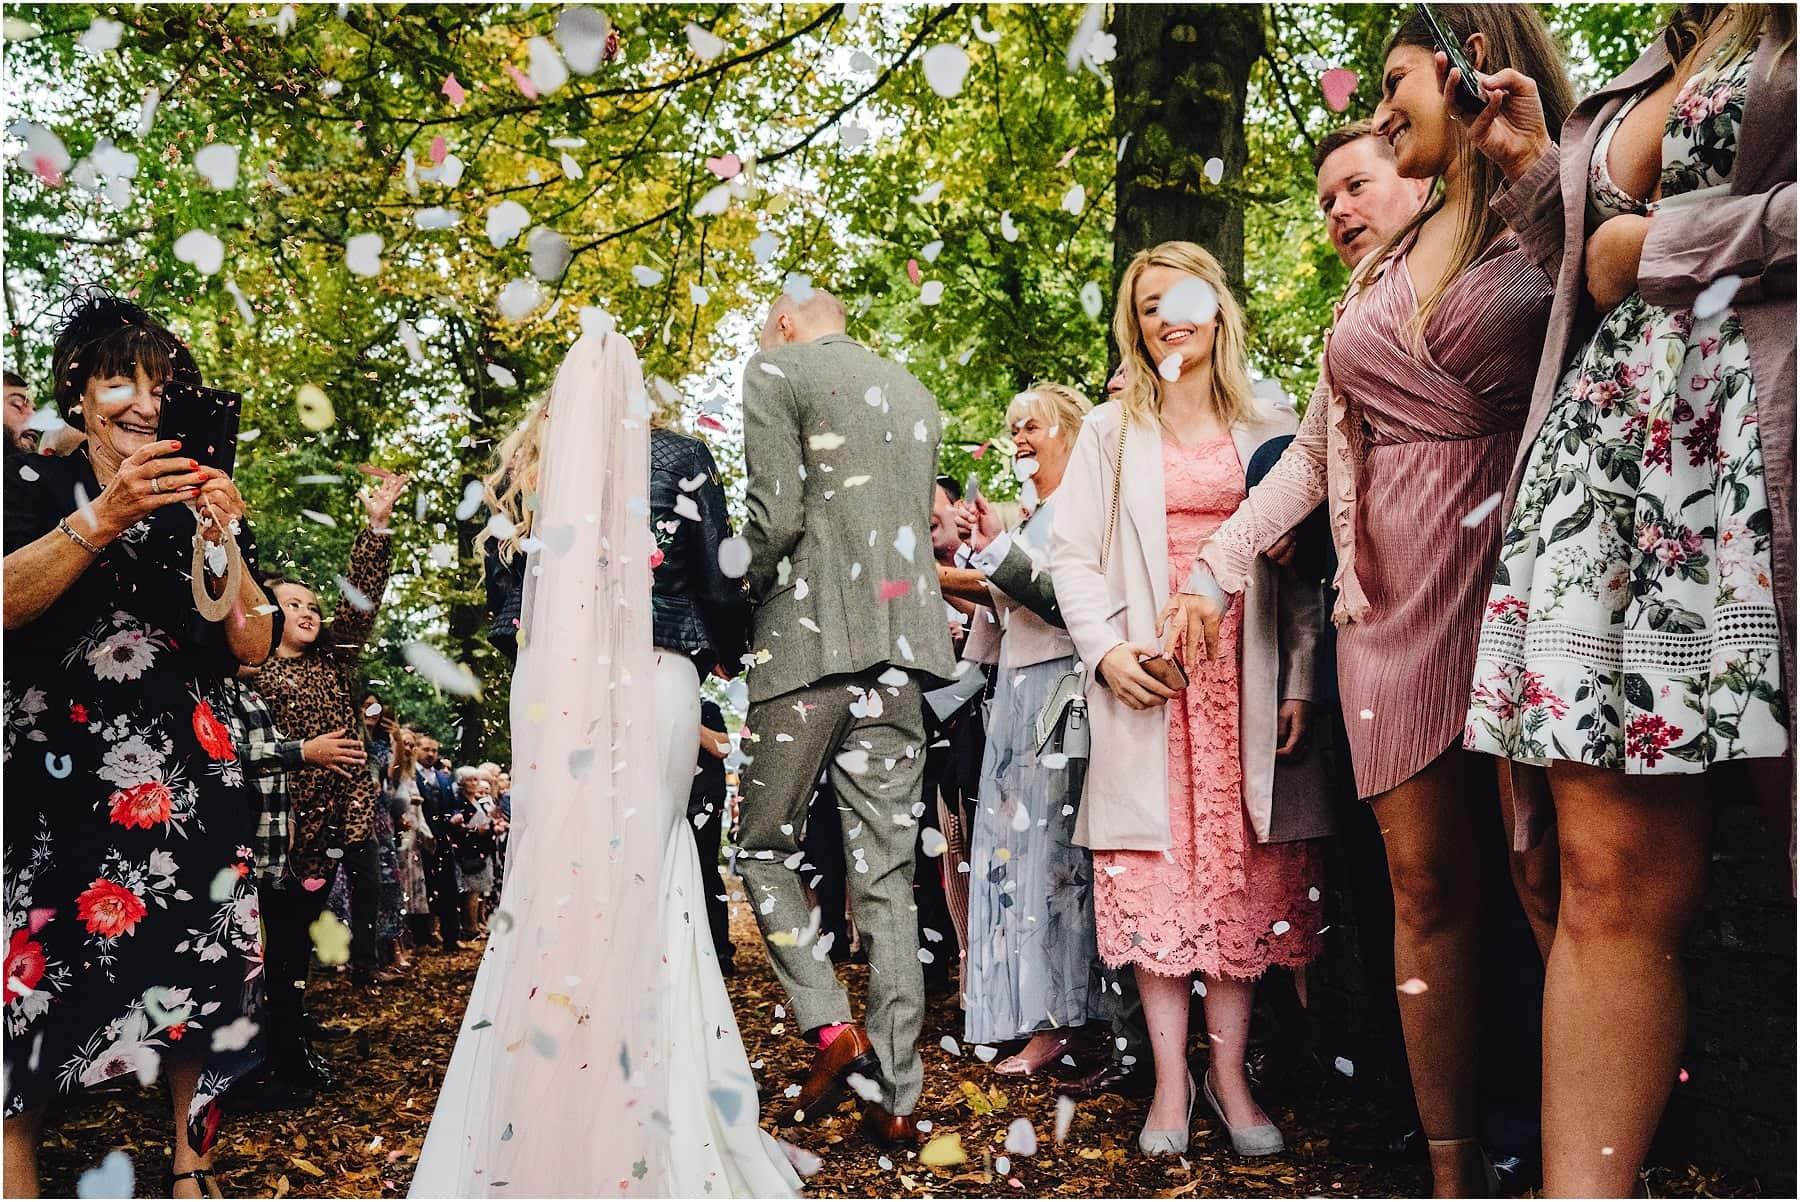 rear photo of bride and groom in a confetti tunnel